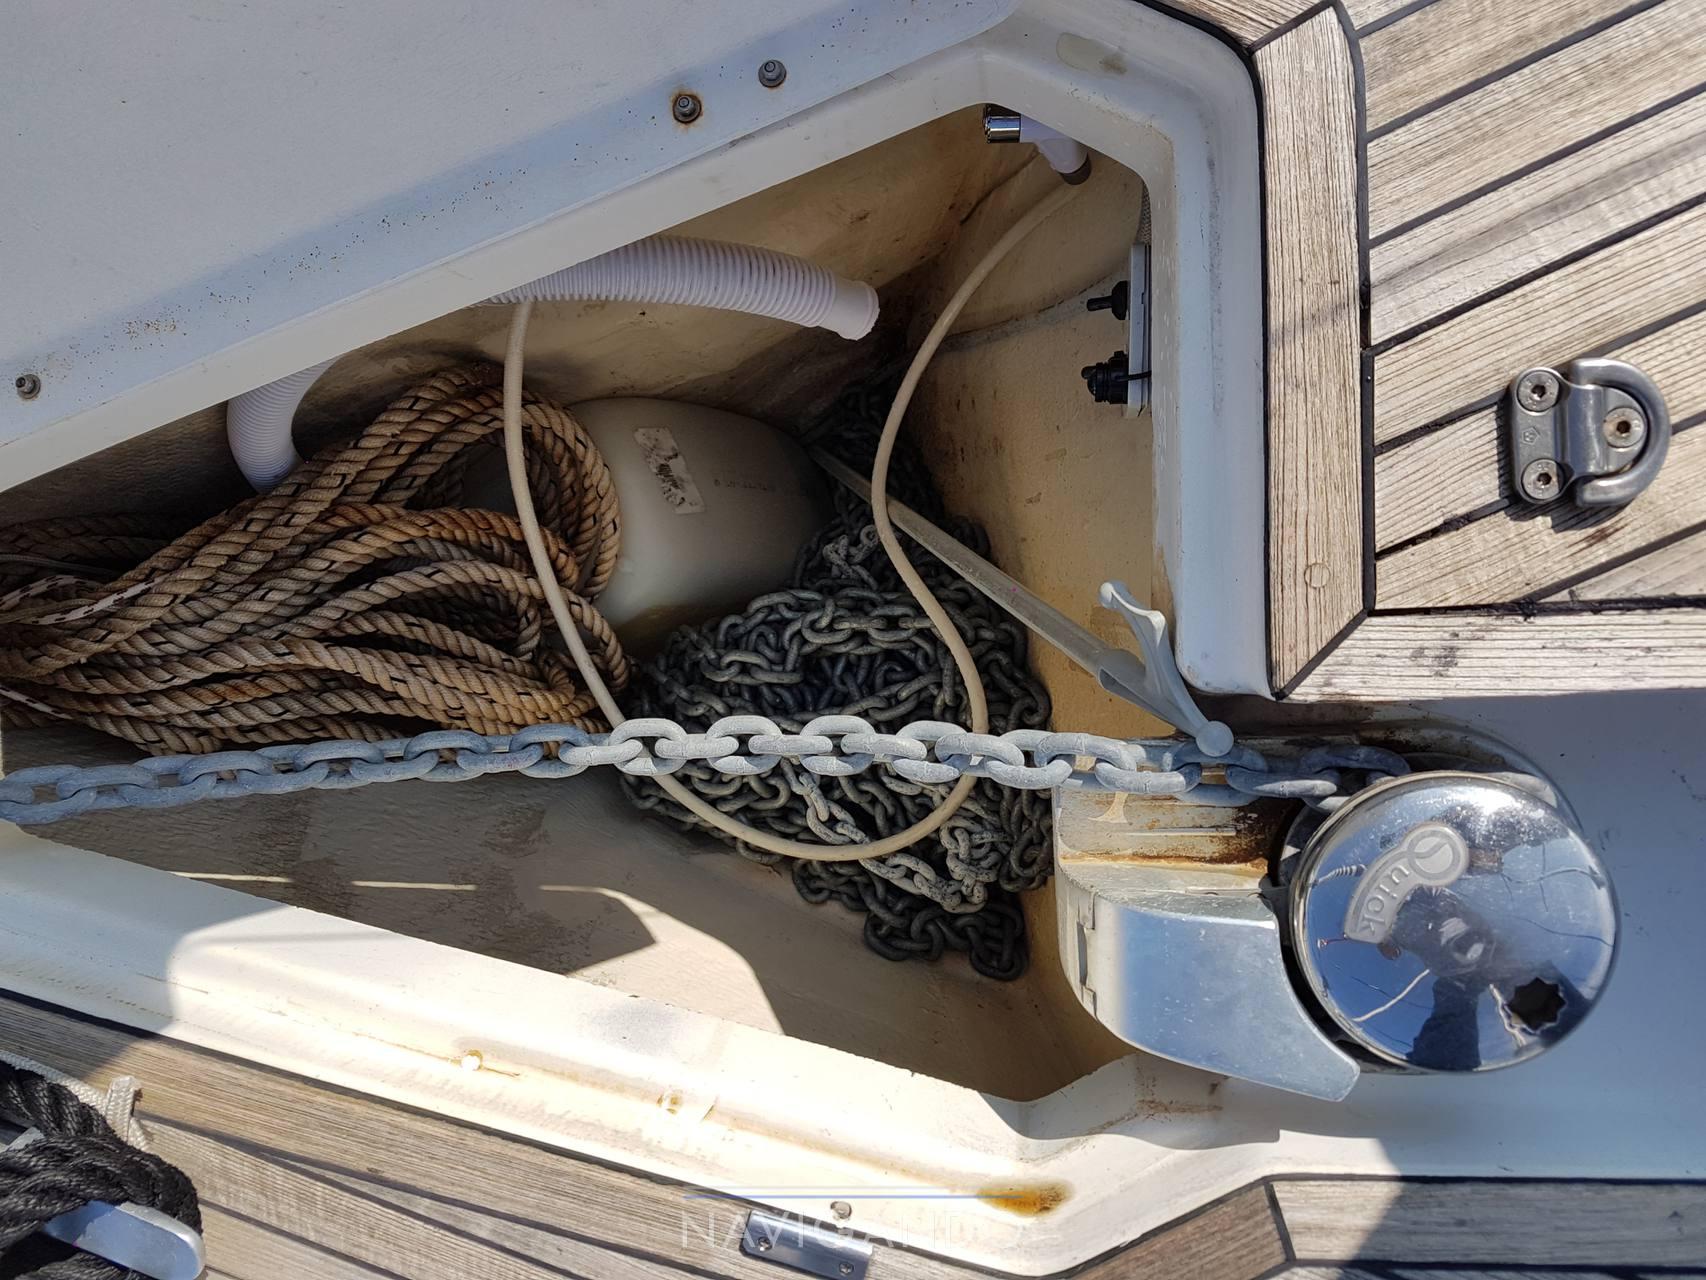 Dufour 385 gl 帆船 用于销售